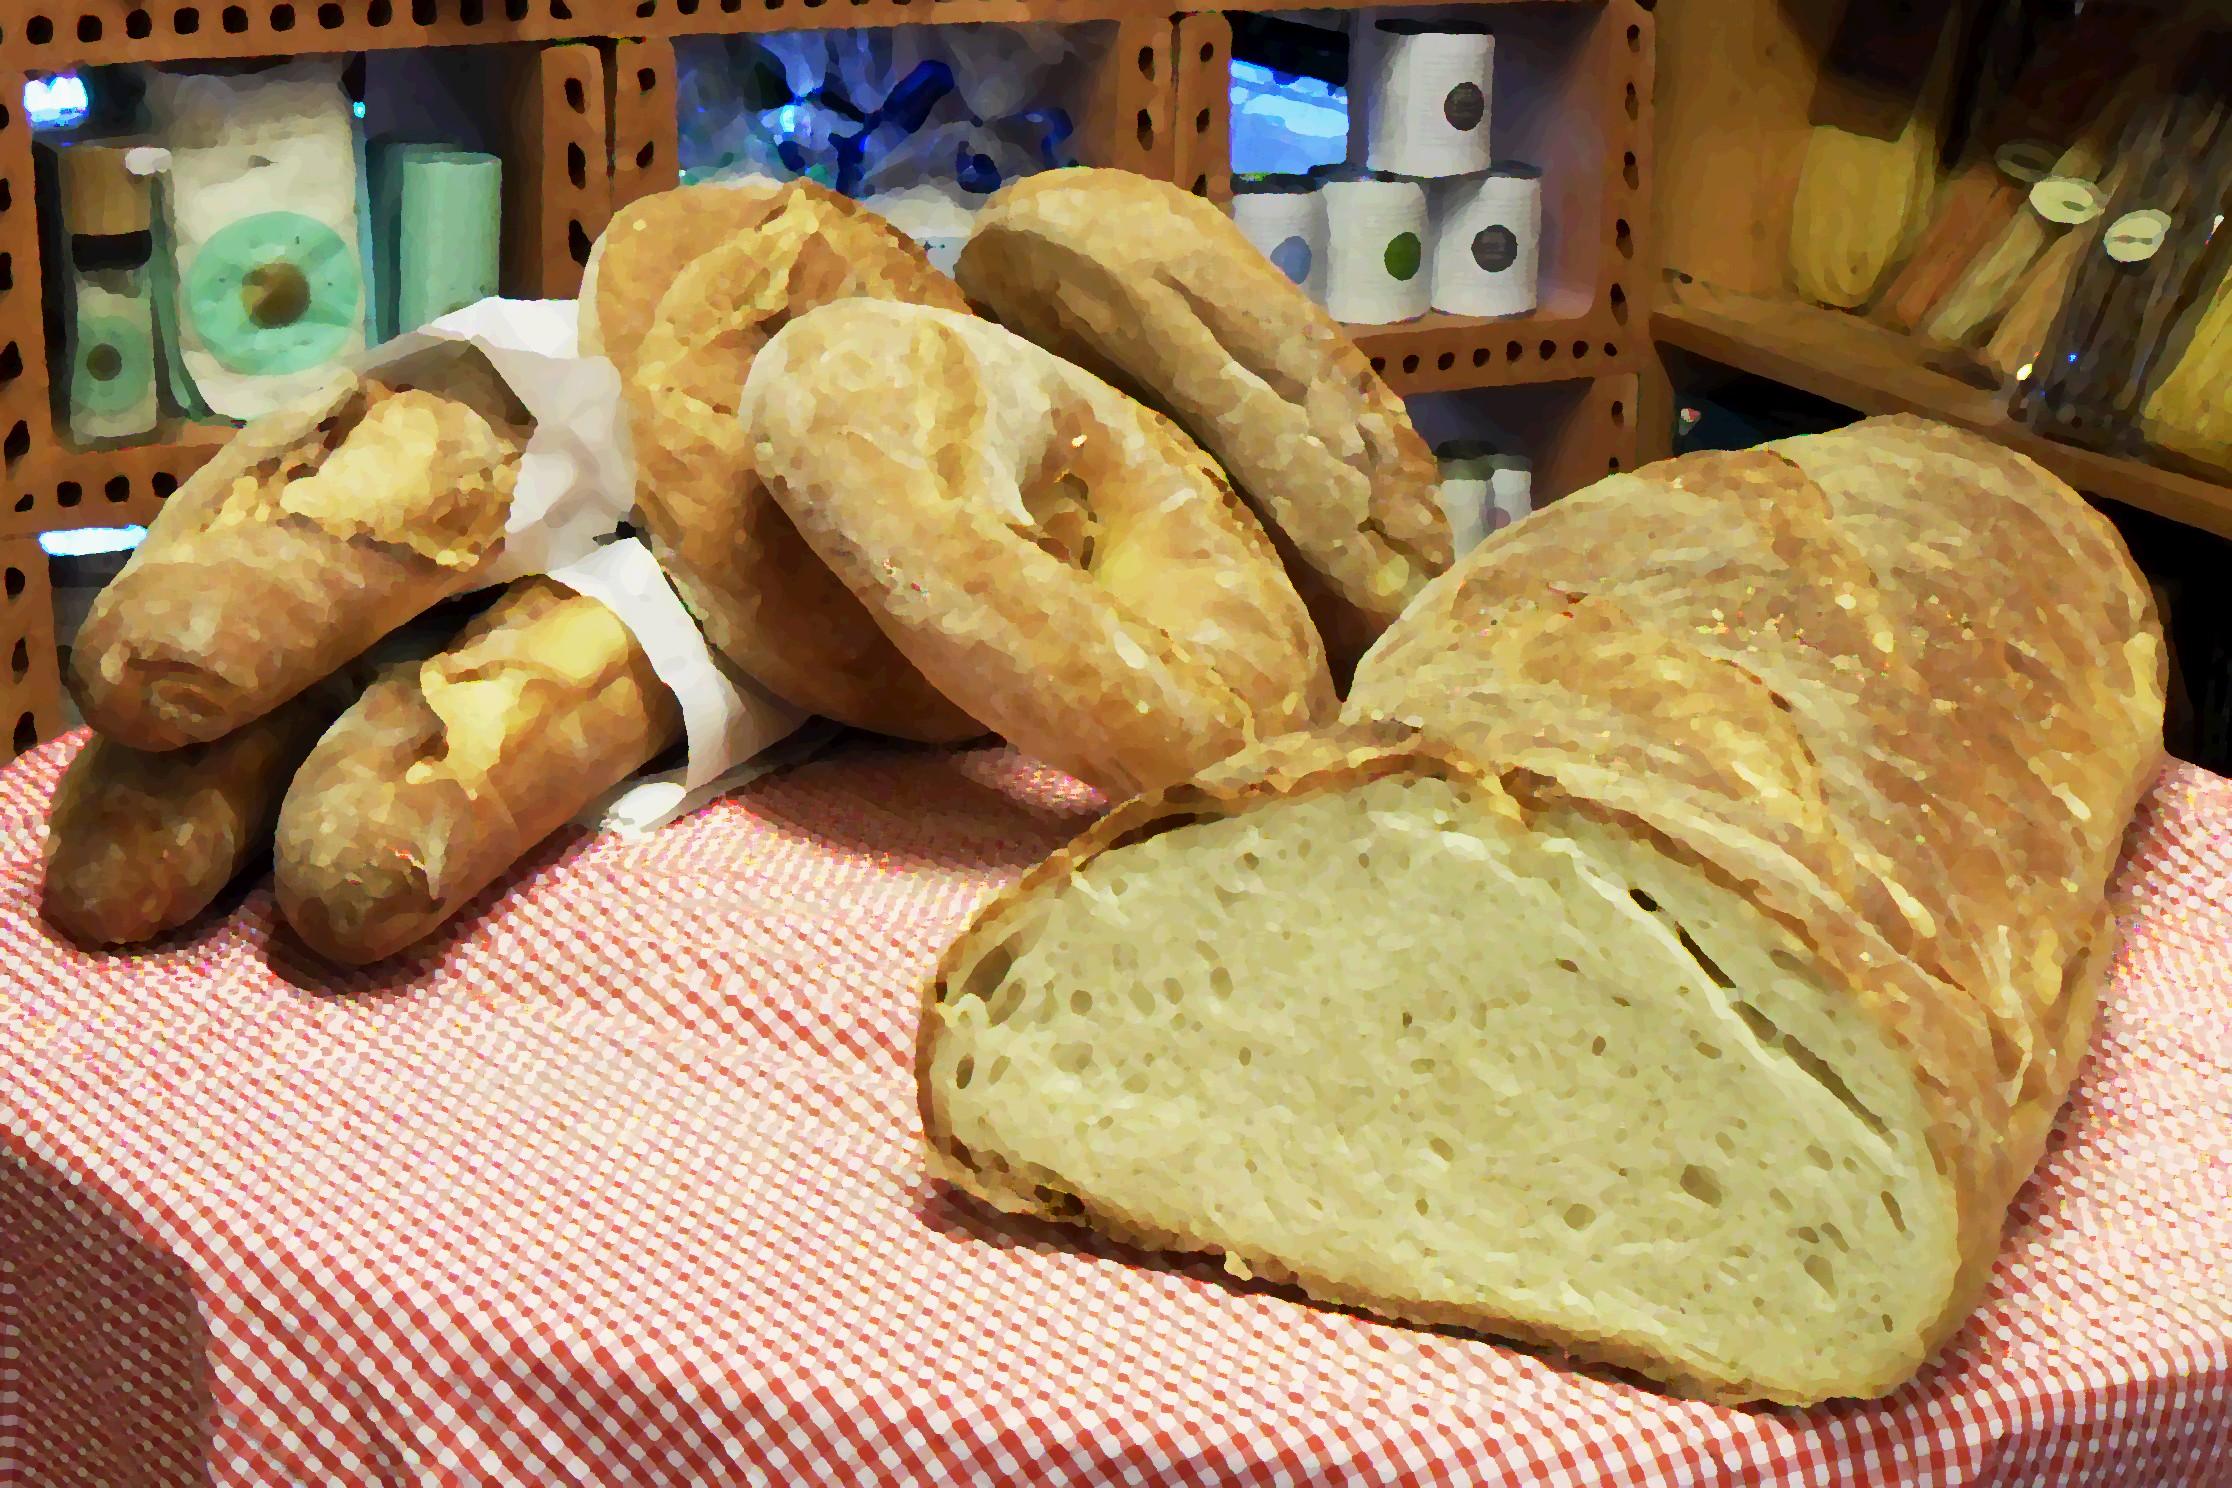 Il Pane, frisches ital. Brot, nur Sa